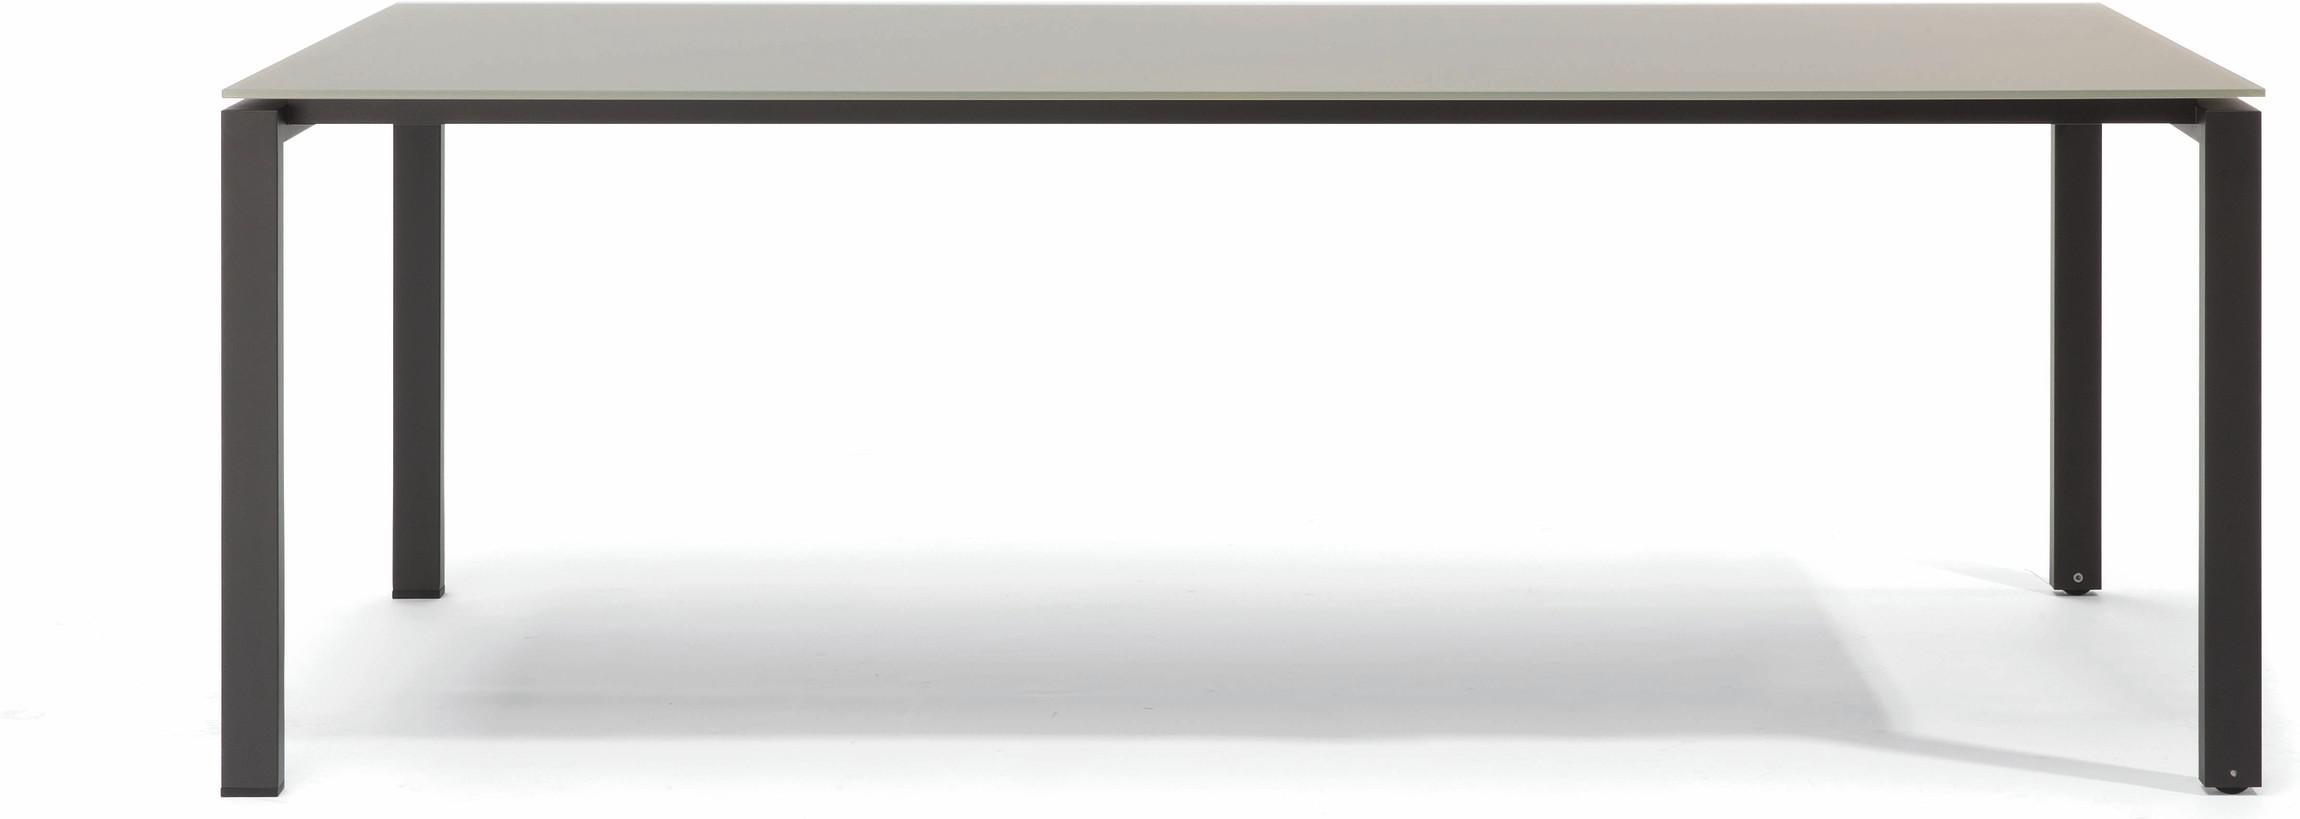 Table à manger Trento - céramique quartz 6mm EQ 270